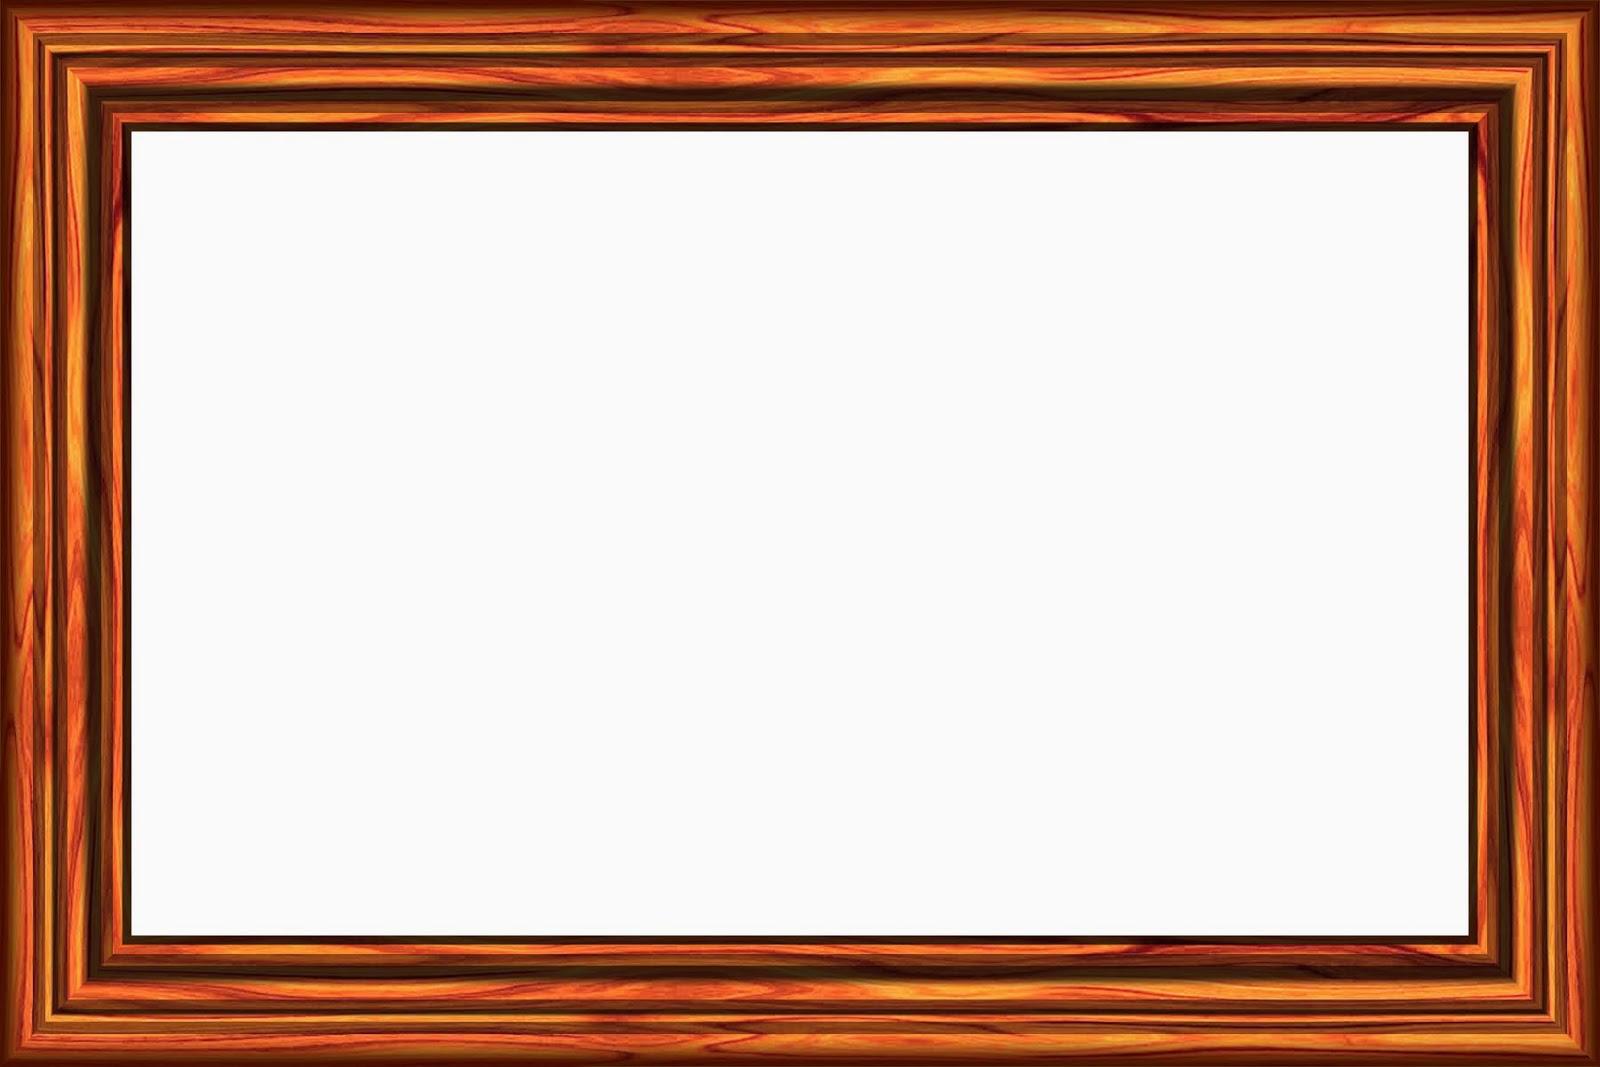 26 Awesome Picture Frame Designs Woodworking egorlincom